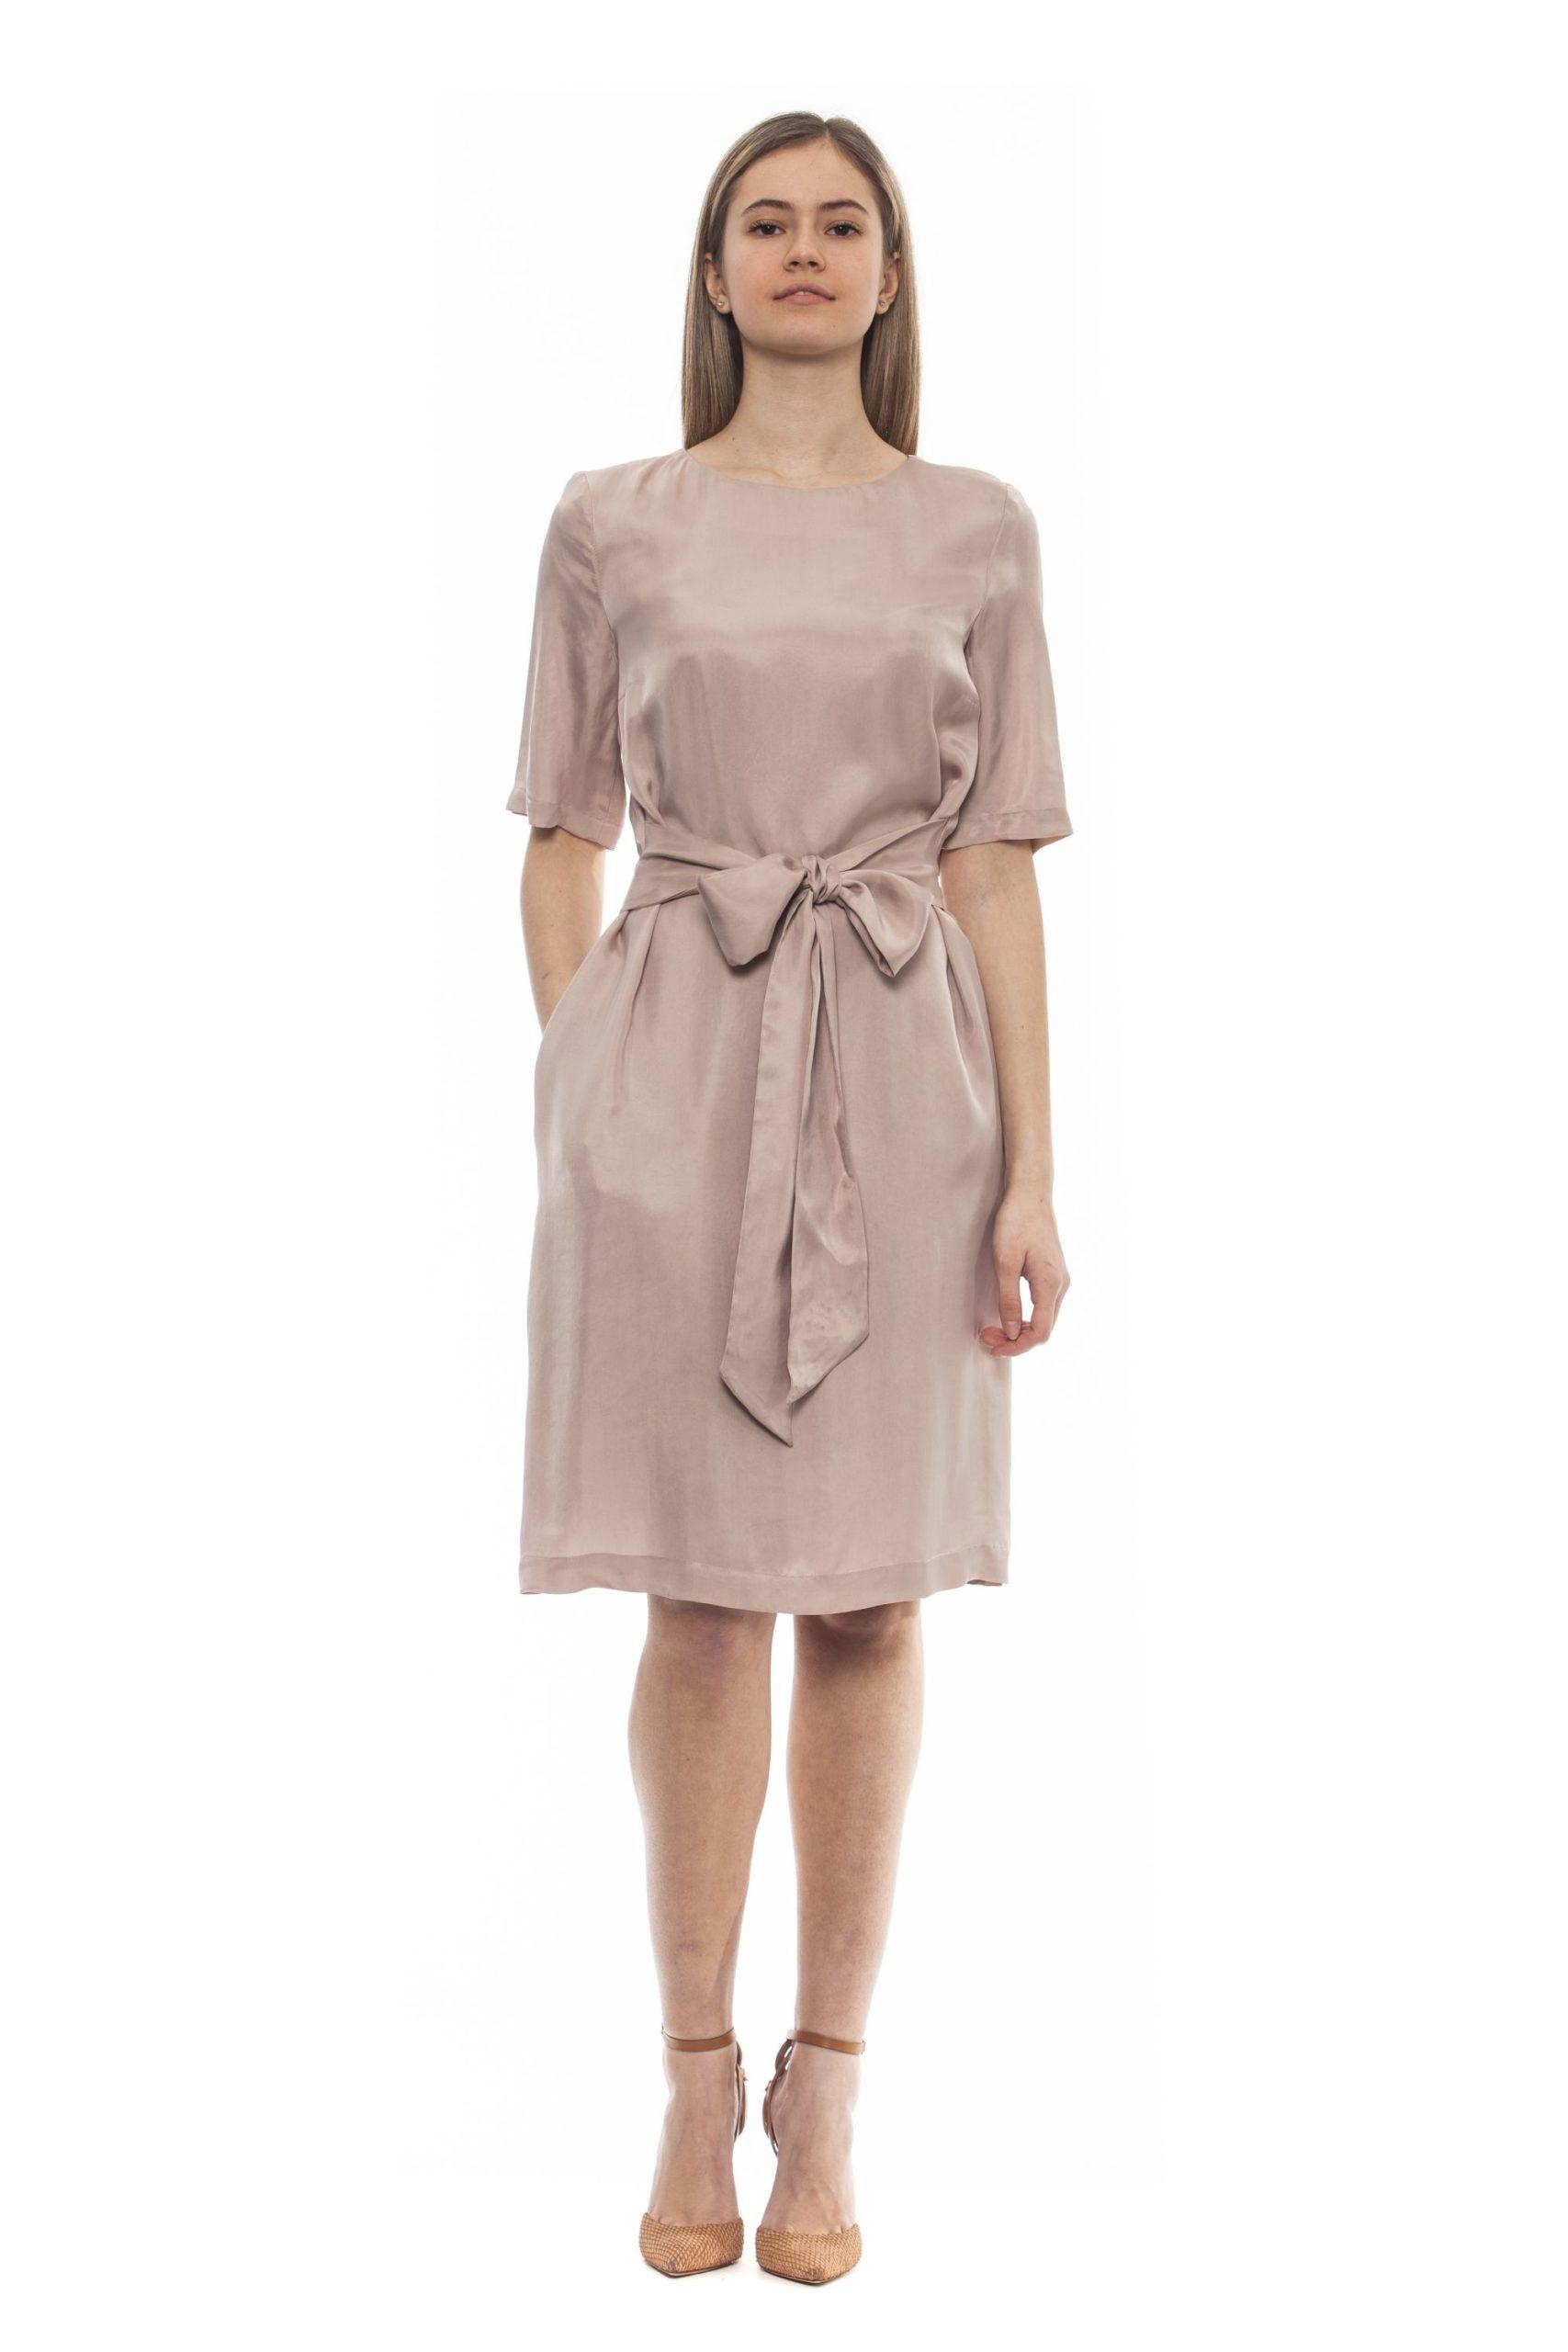 Peserico Women's Rosa Dress Pink PE1383196 - IT42 | S